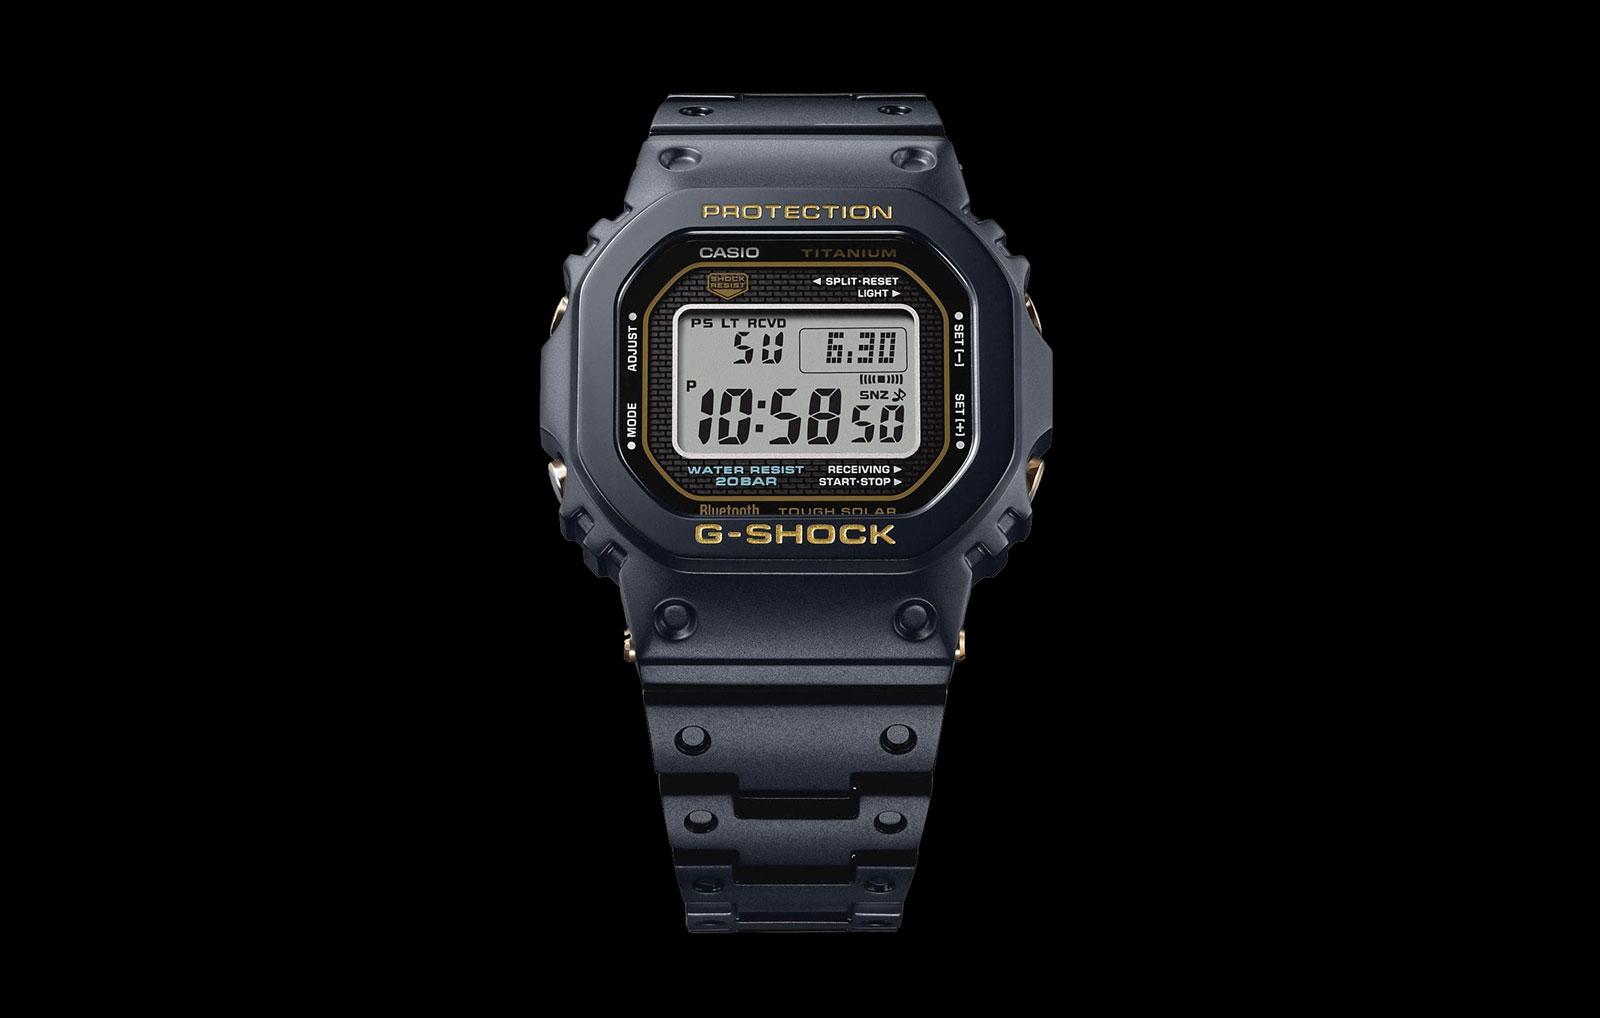 Casio G-Shock GMW-B5000TB Titanium